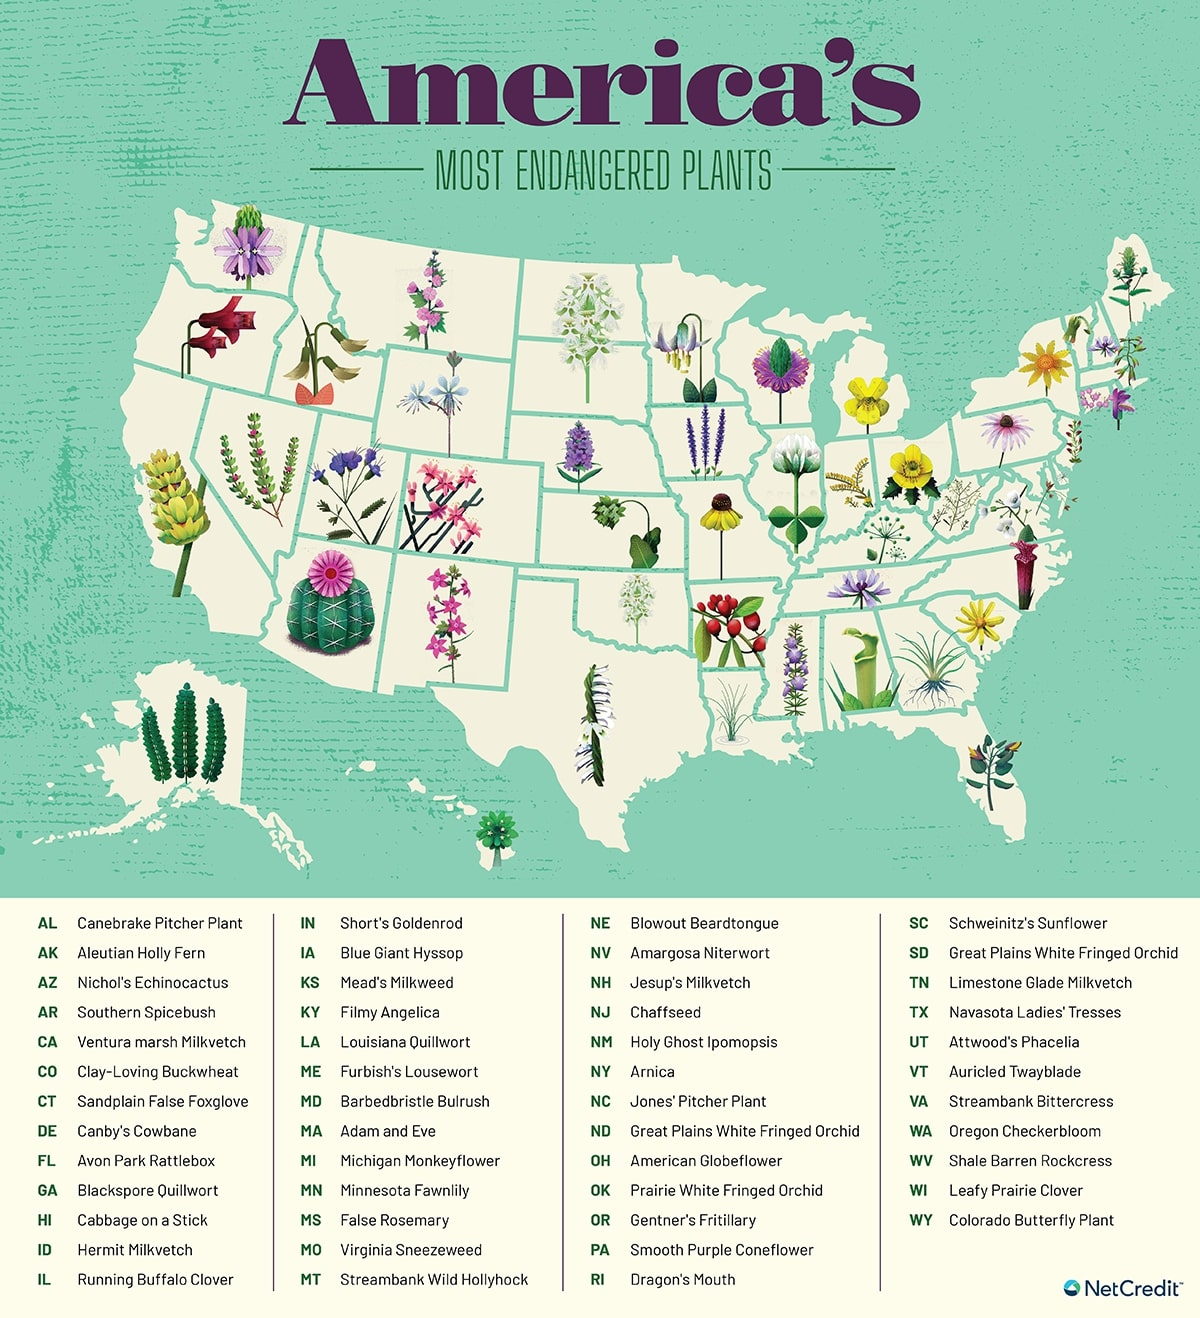 America's Most Endangered Plants